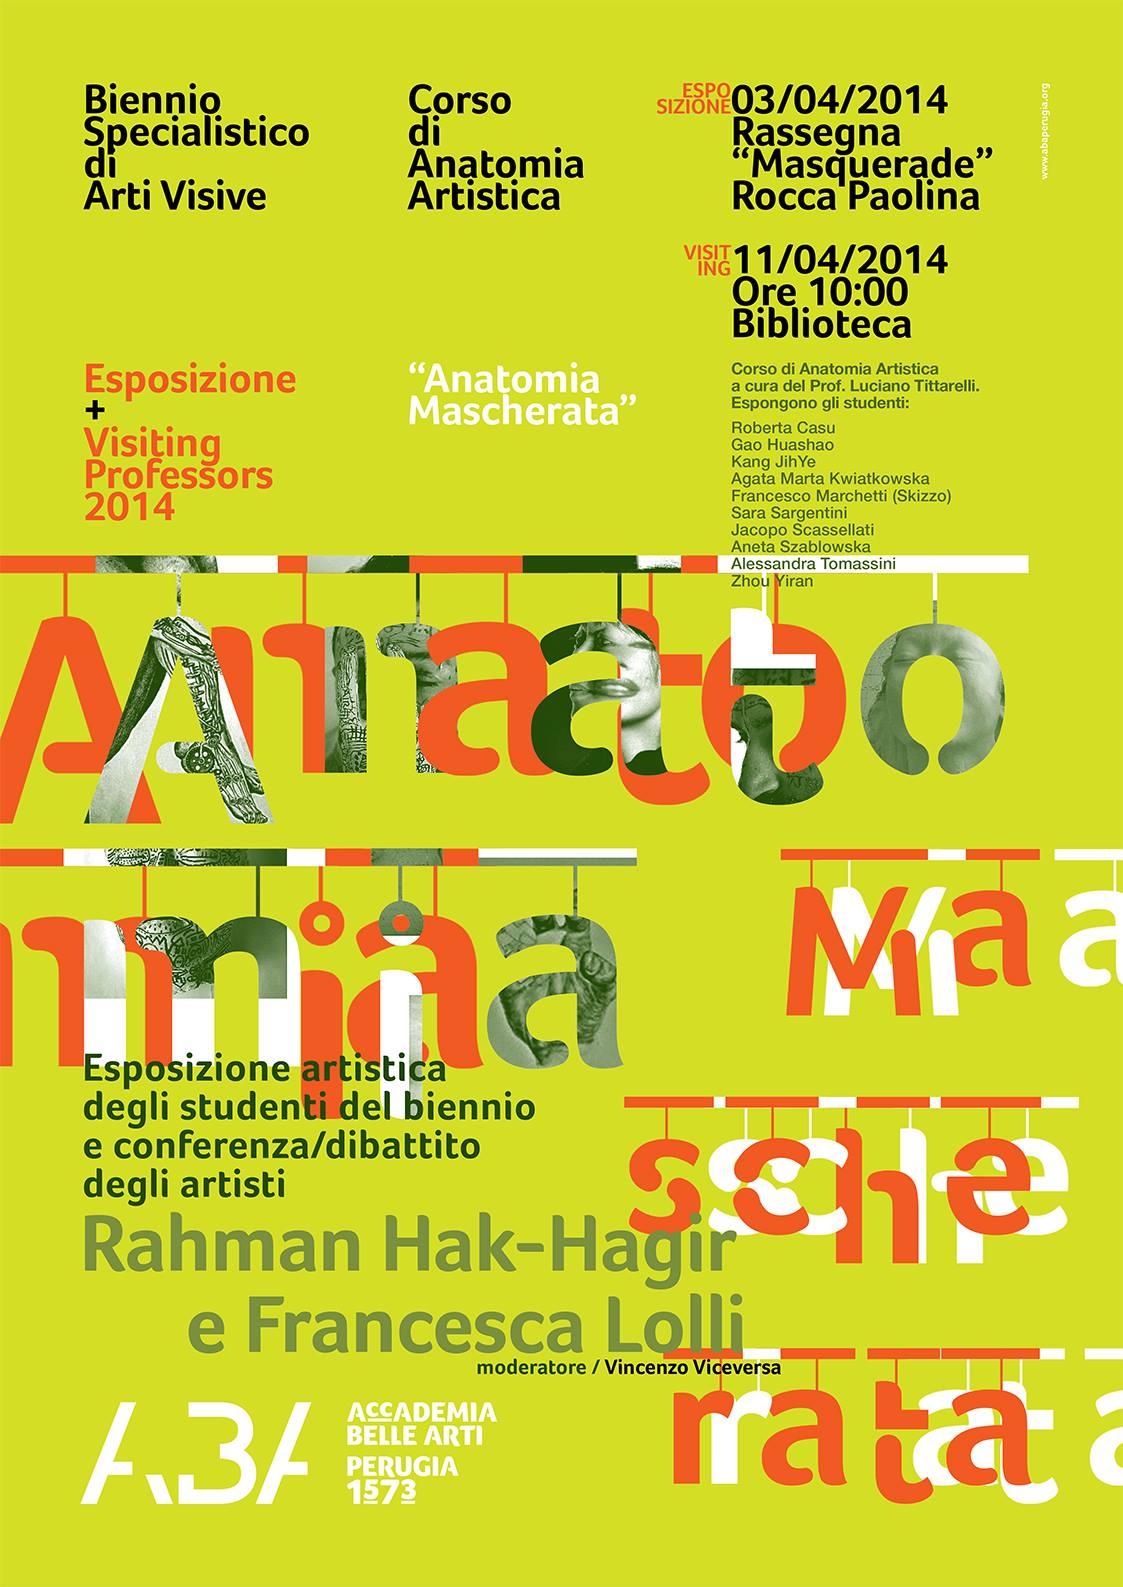 Rahman Hak-Hagir - Accademia Belle Arti Perugia